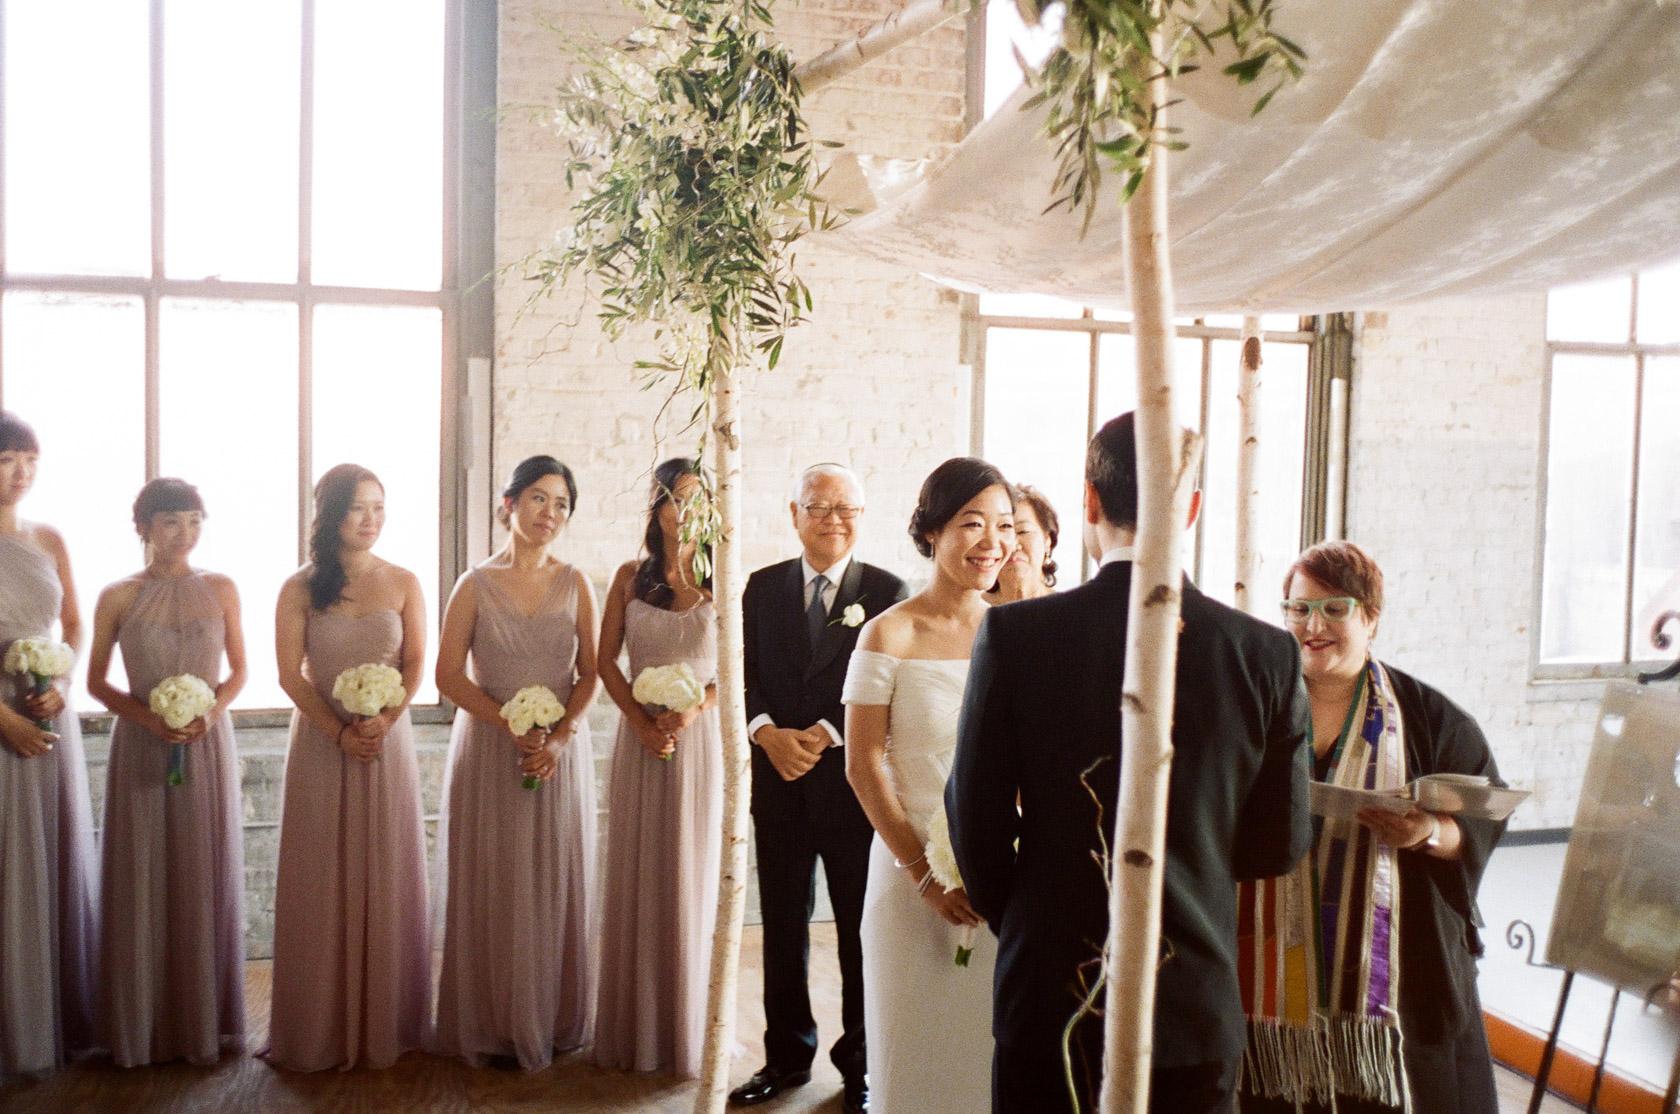 Louie regakis wedding